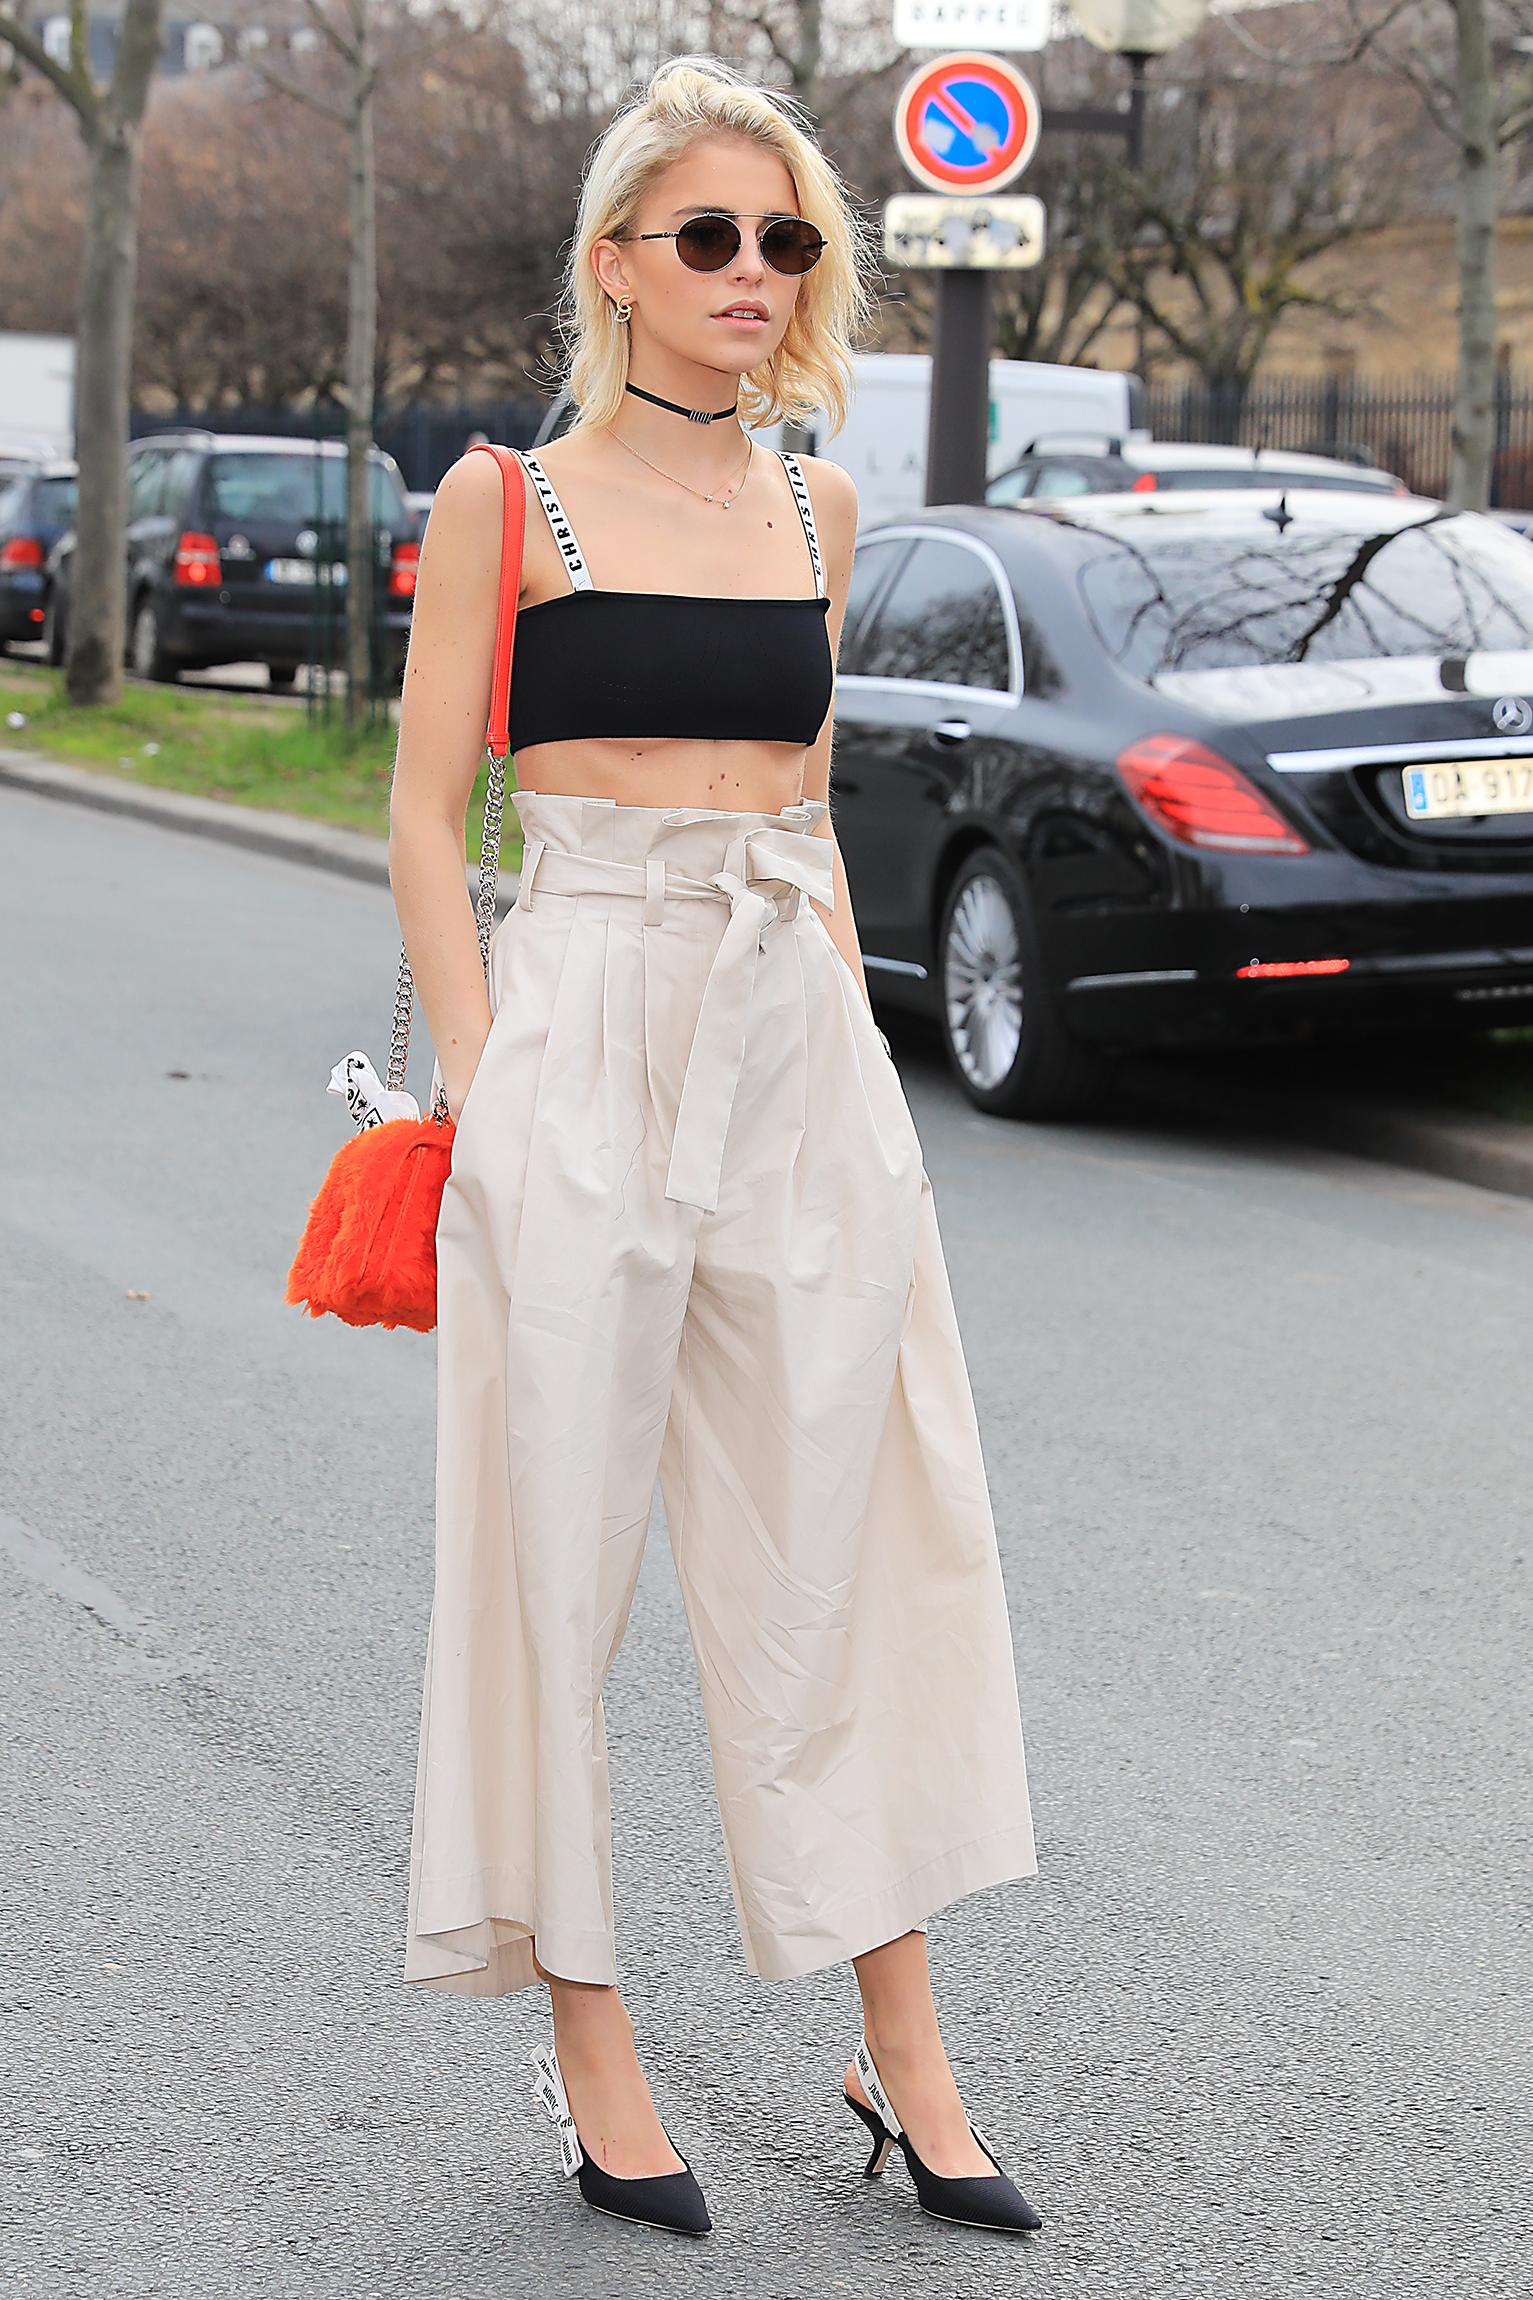 Caro Daur seen leaving Dior Fall Winter 2017 Women show during Paris Fashion Week <P> Pictured: Caro Daur <B>Ref: SPL1455934  030317  </B><BR/> Picture by: Splash News<BR/> </P><P> <B>Splash News and Pictures</B><BR/> Los Angeles:310-821-2666<BR/> New York:212-619-2666<BR/> London:870-934-2666<BR/> <span id=